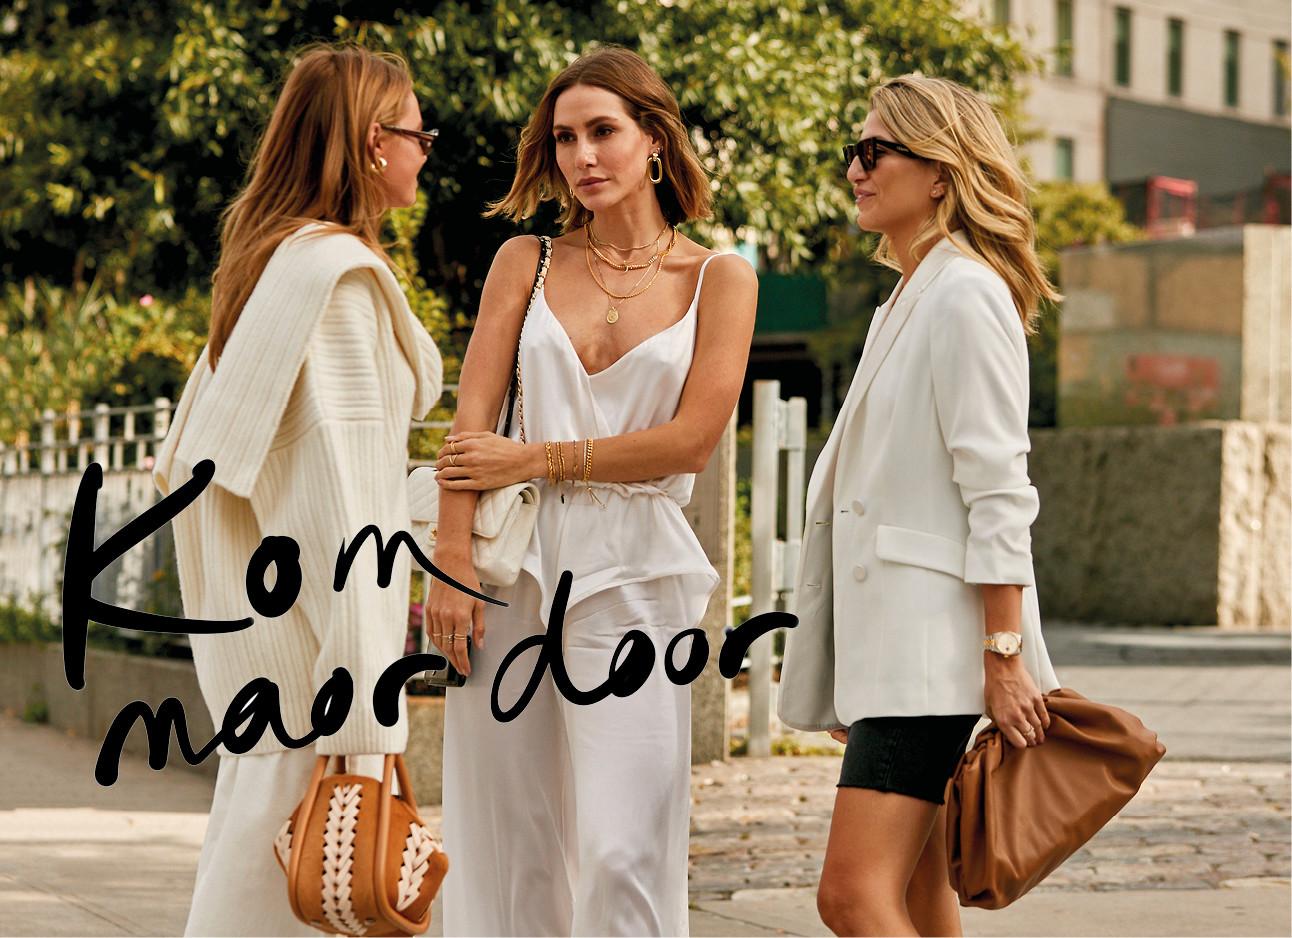 Meiden die in newyork in witte kleding buiten staan